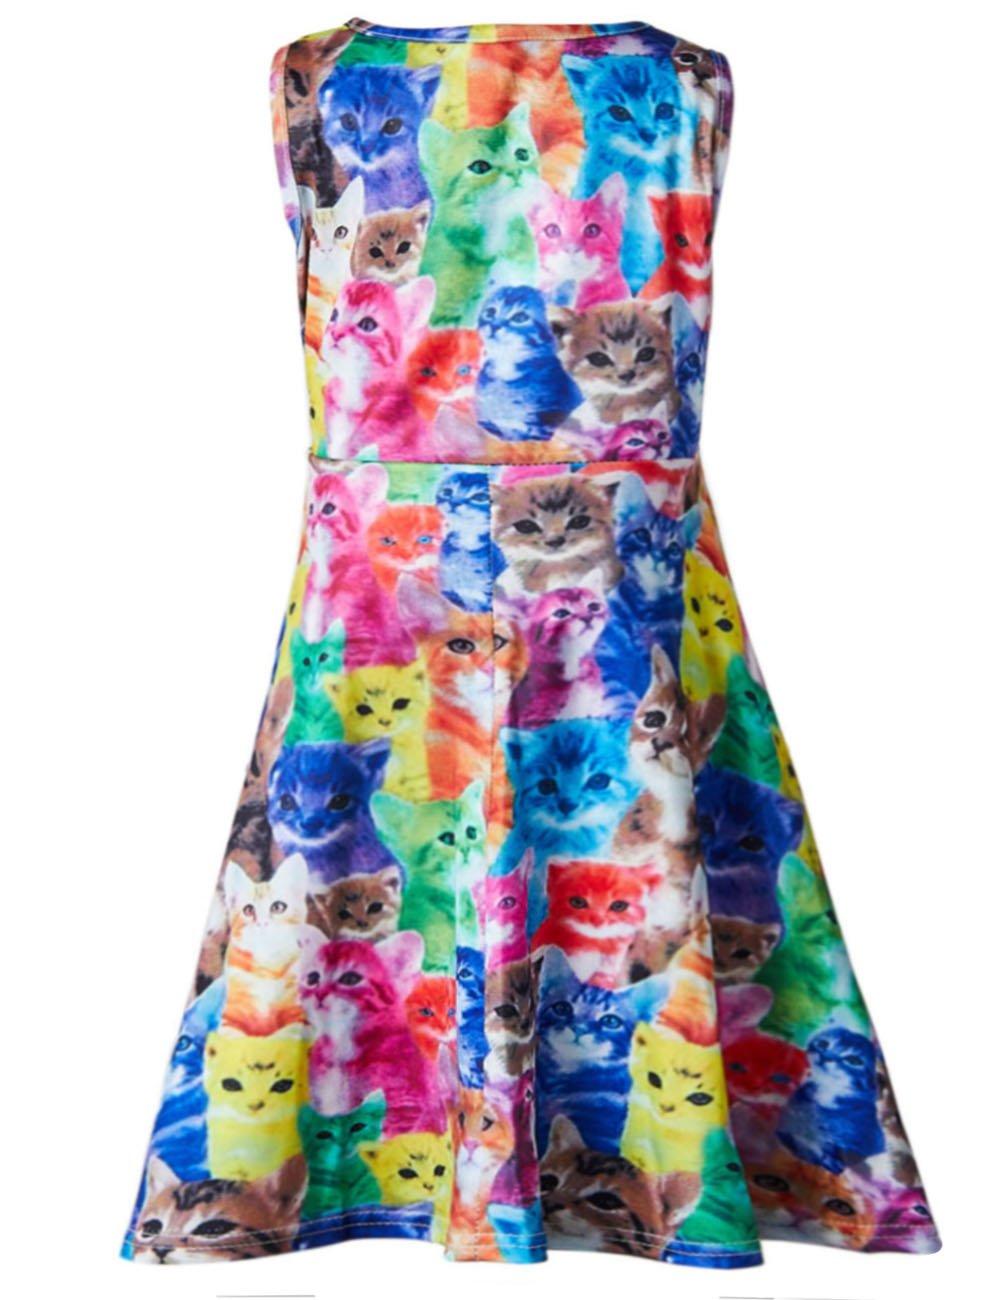 Leapparel Little Girls Dress Sweet Print Colorful Cats Pattern Sleeveless Dress Rainbow 4T